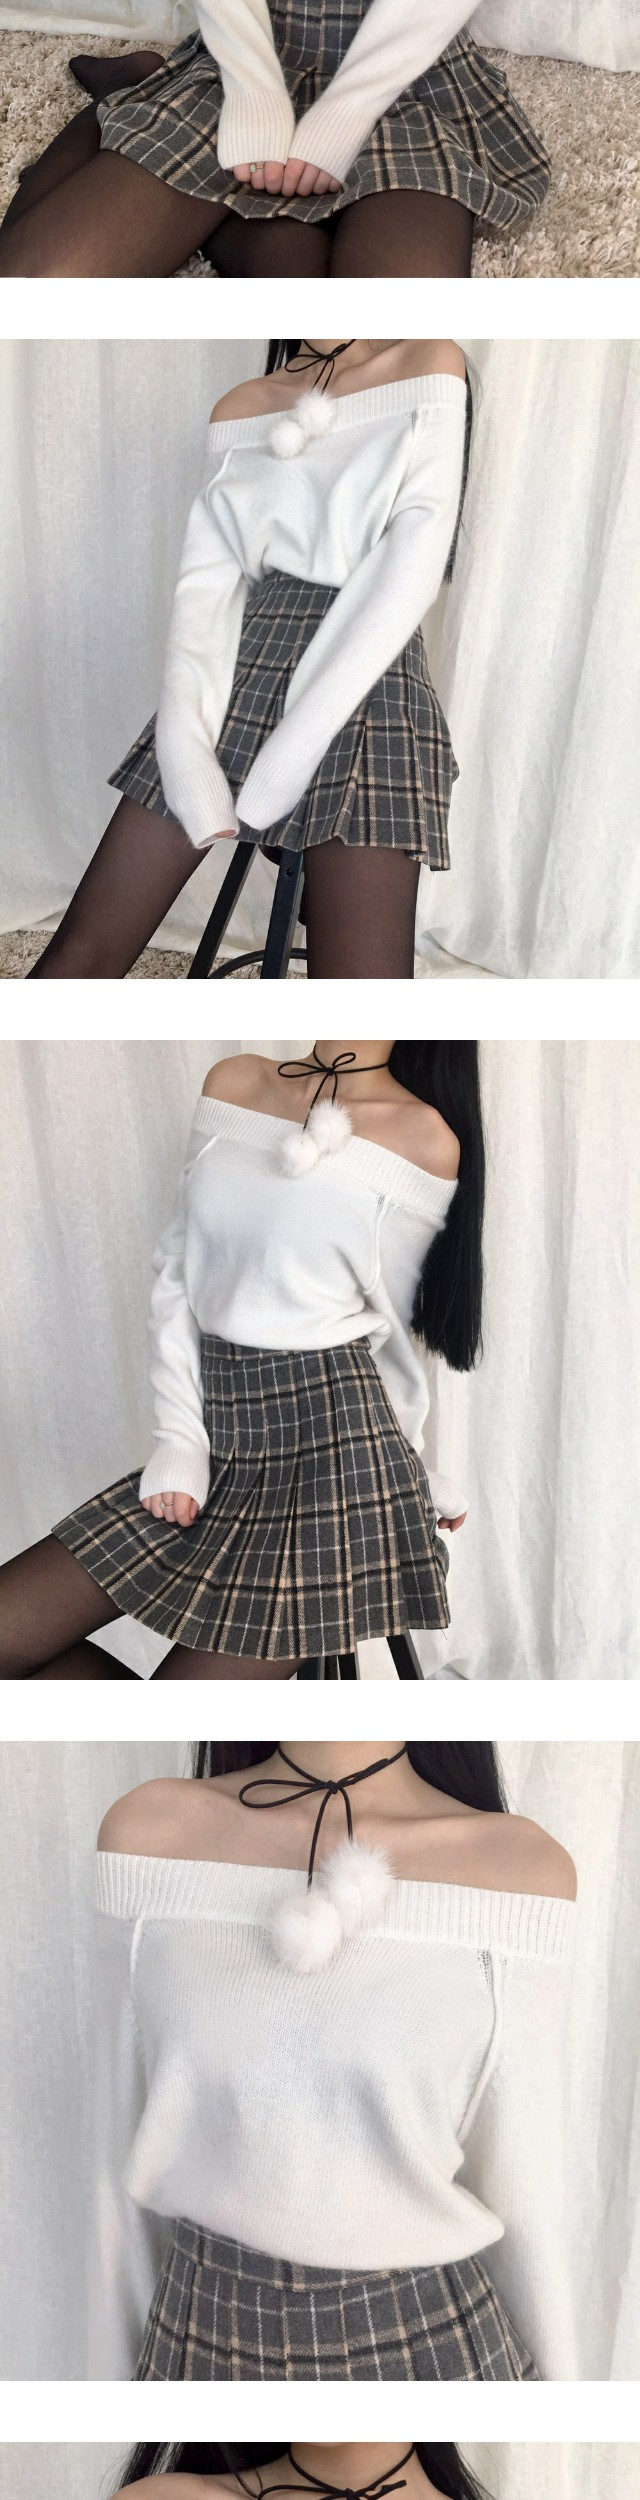 Ellie Check Tennis Skirt